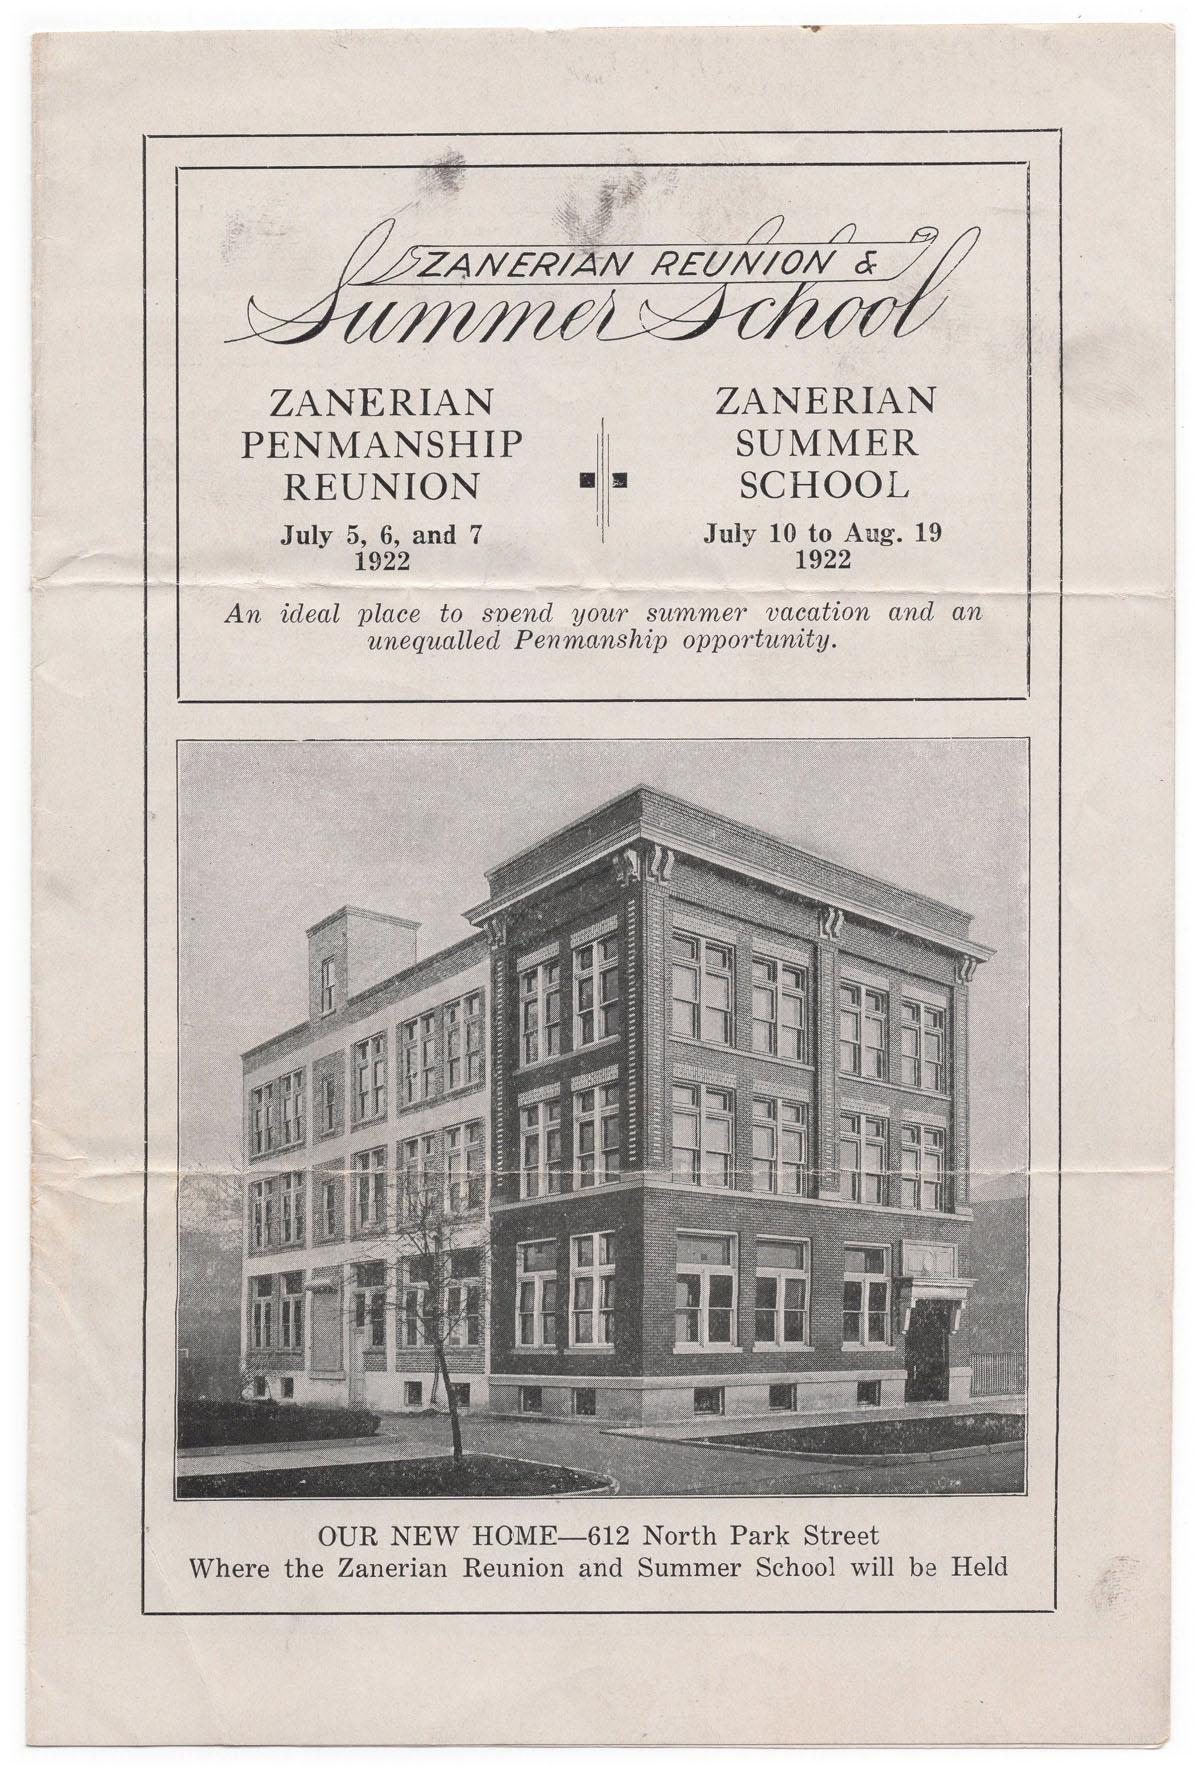 Masgrimes Zanerian Summer School & Reunion, American Penmanship